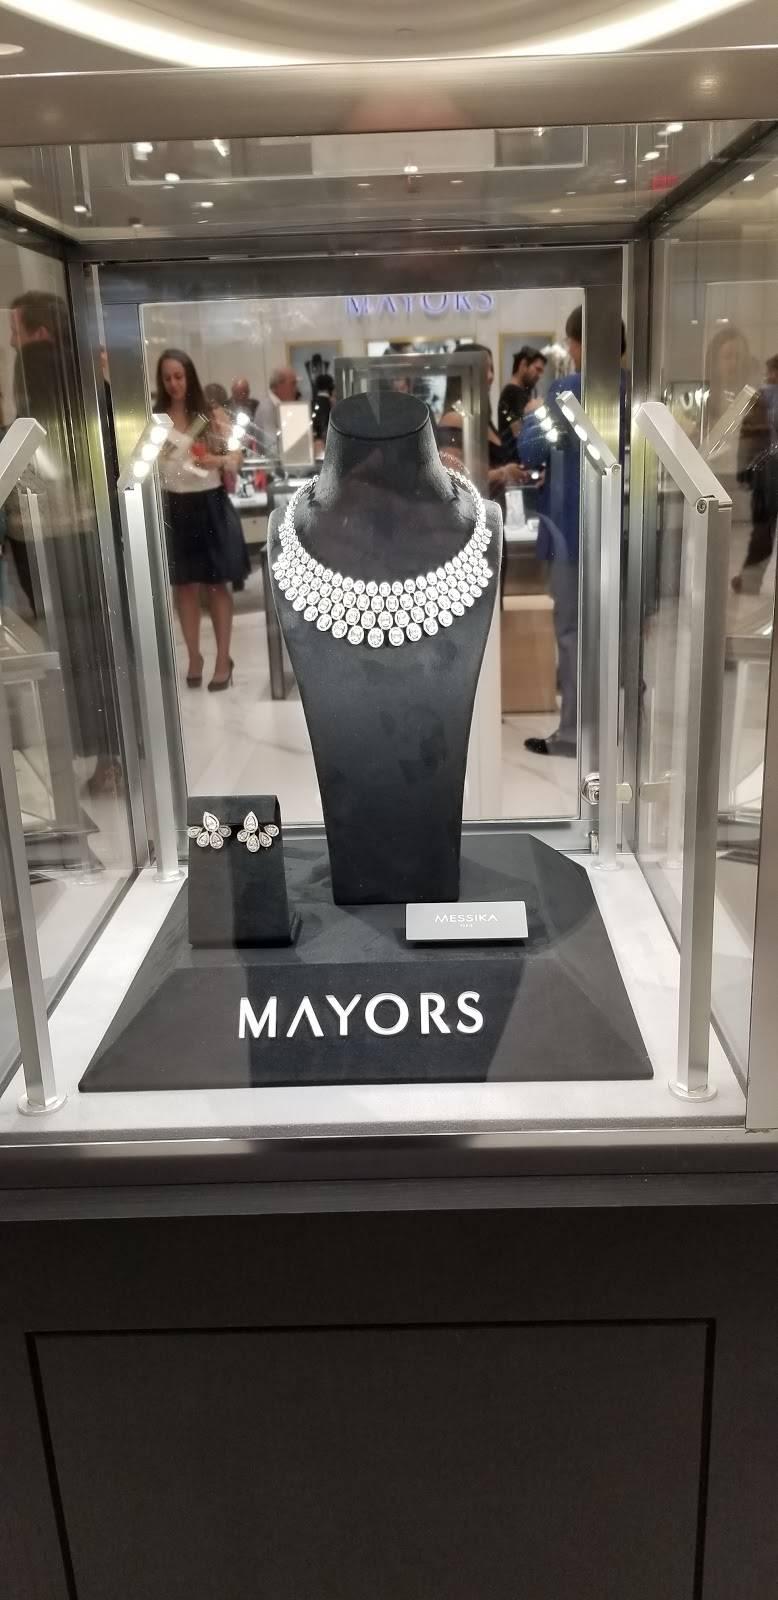 Mayors Jewelers - jewelry store  | Photo 3 of 7 | Address: 342 San Lorenzo Ave STE 1000, Coral Gables, FL 33146, USA | Phone: (305) 446-1233